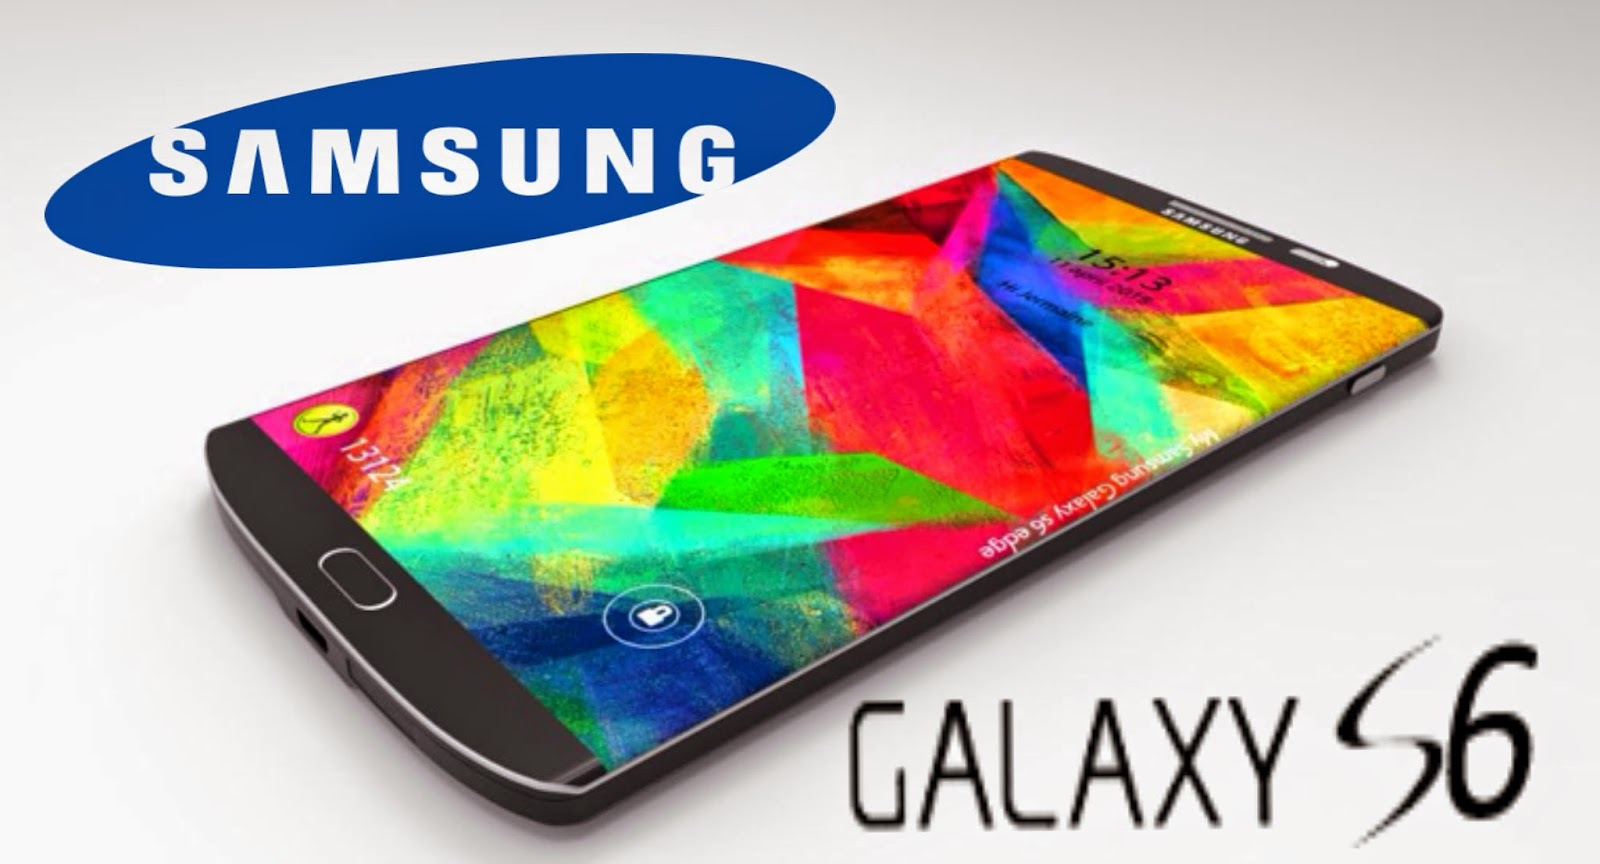 harga samsung galaxy S6 terbaru